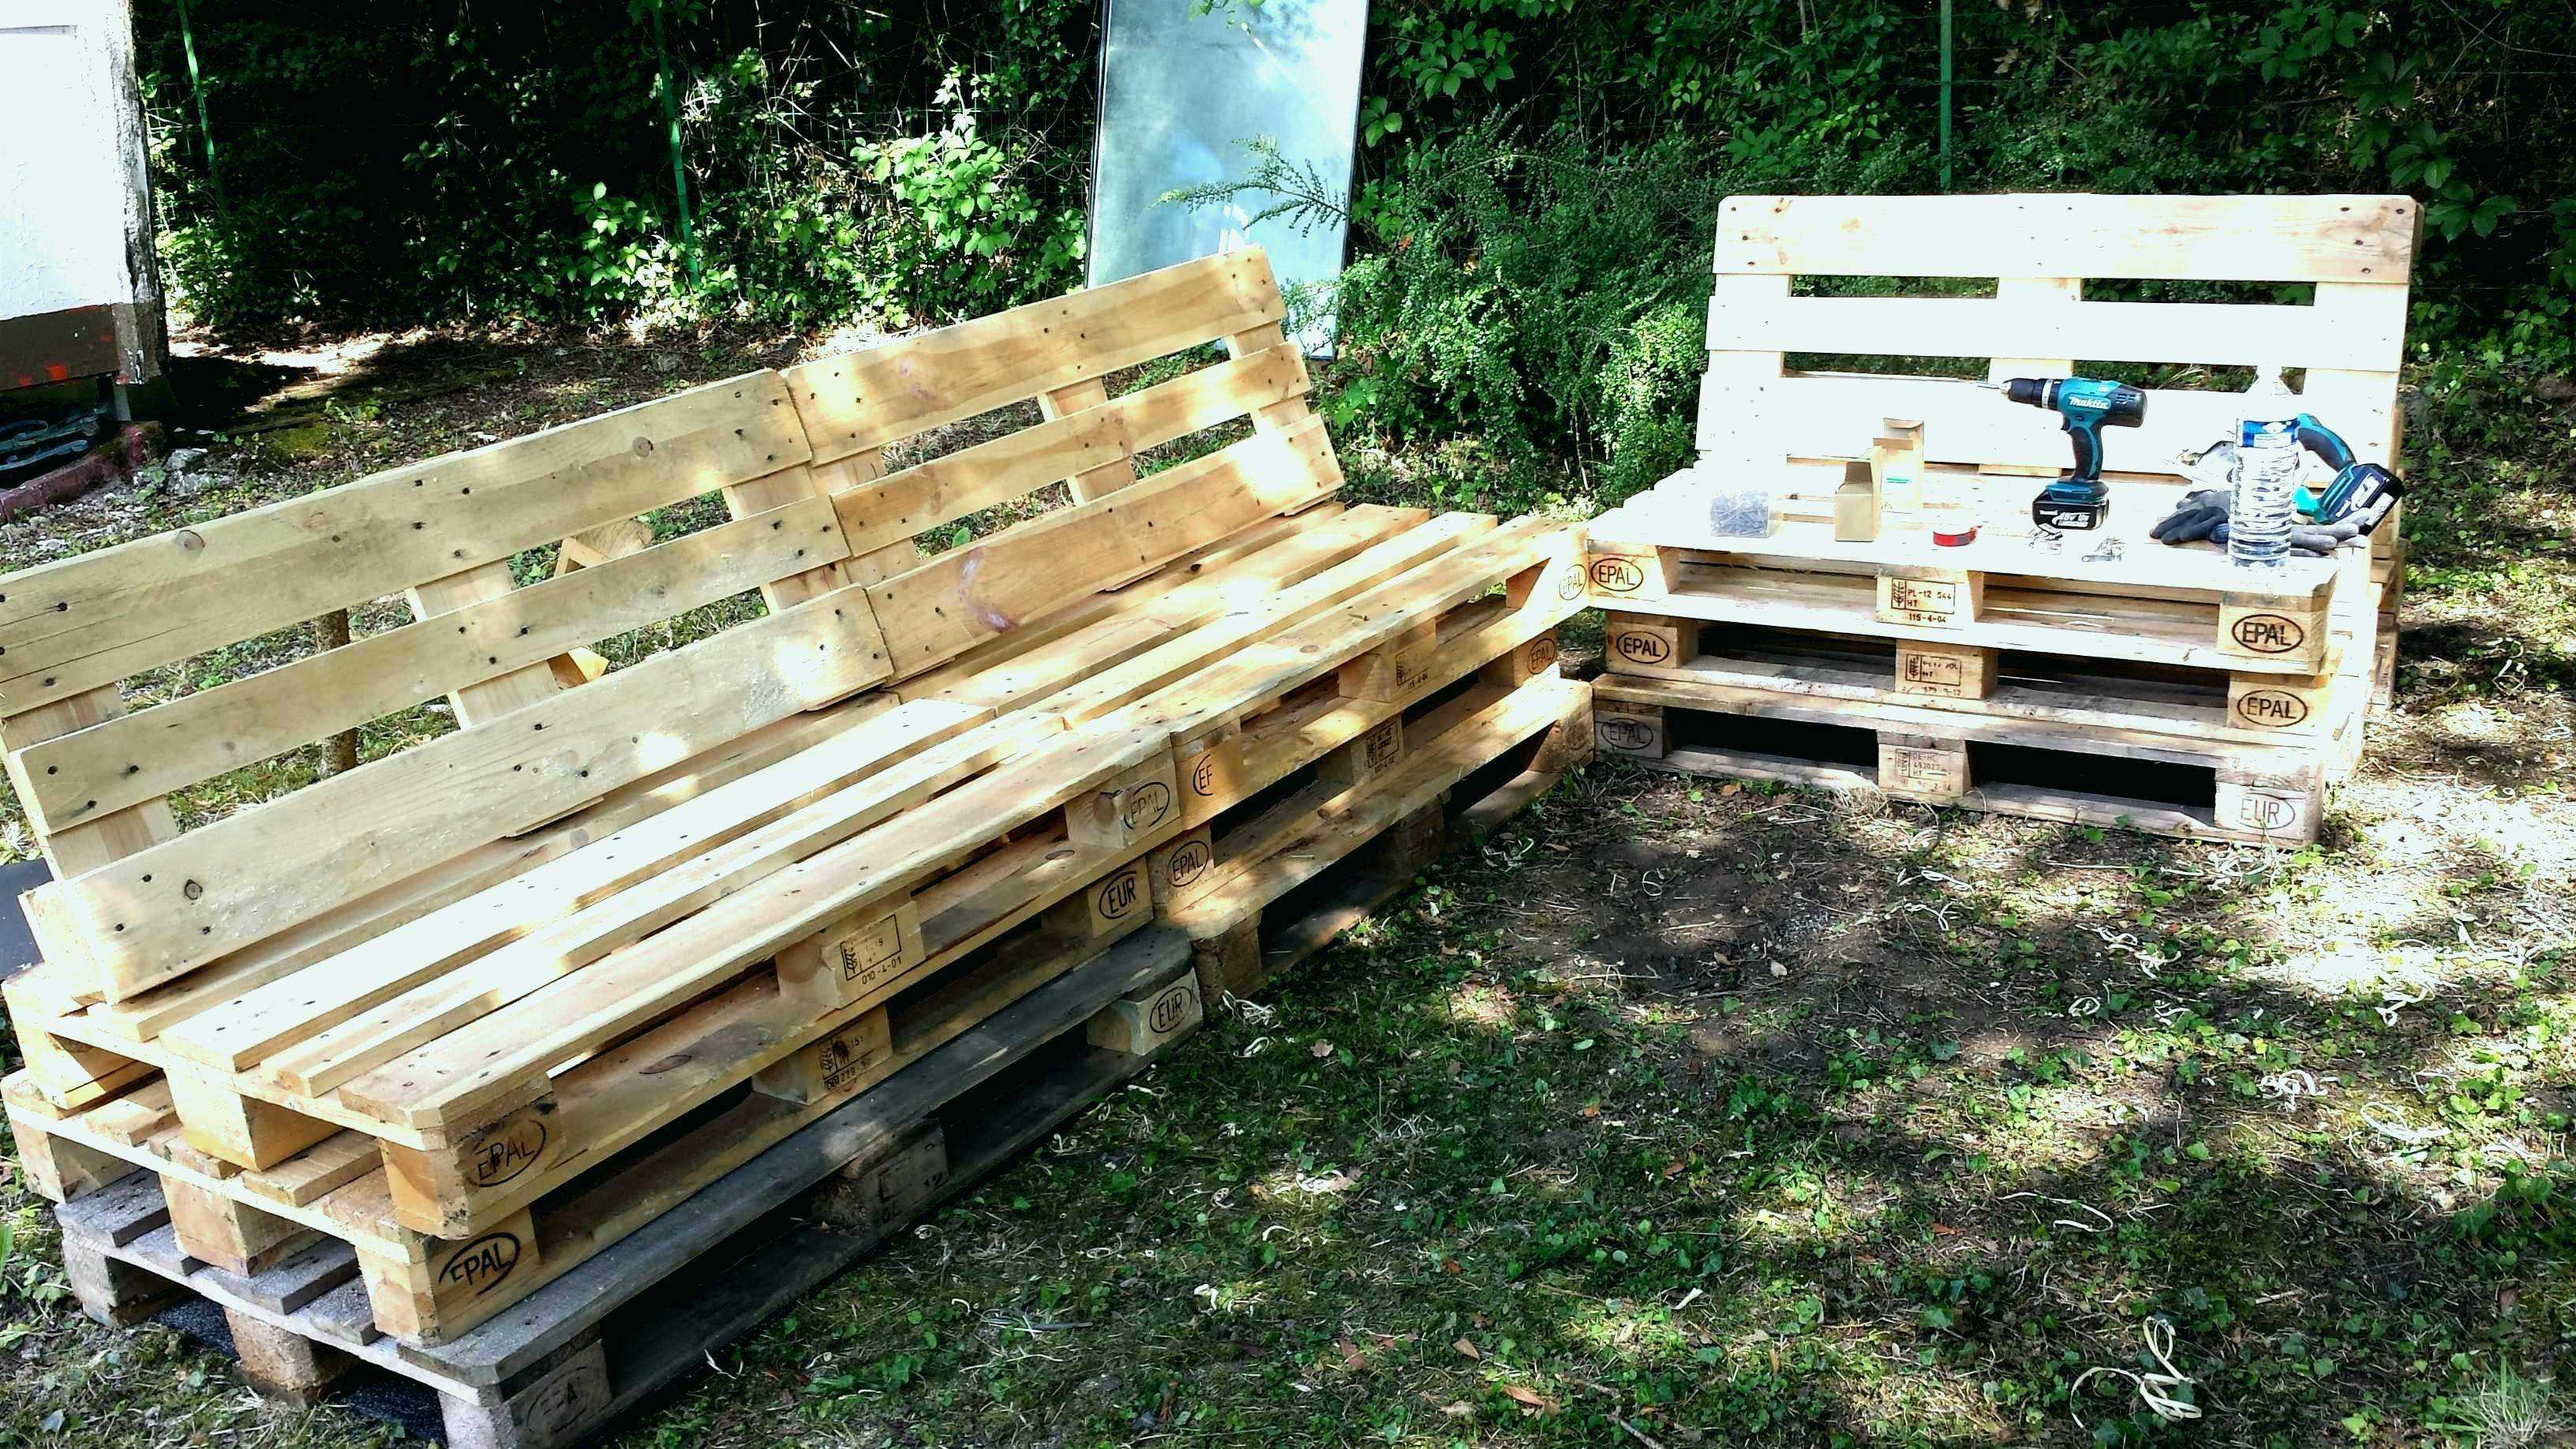 Fabriquer salon de jardin pas cher - Mailleraye.fr jardin